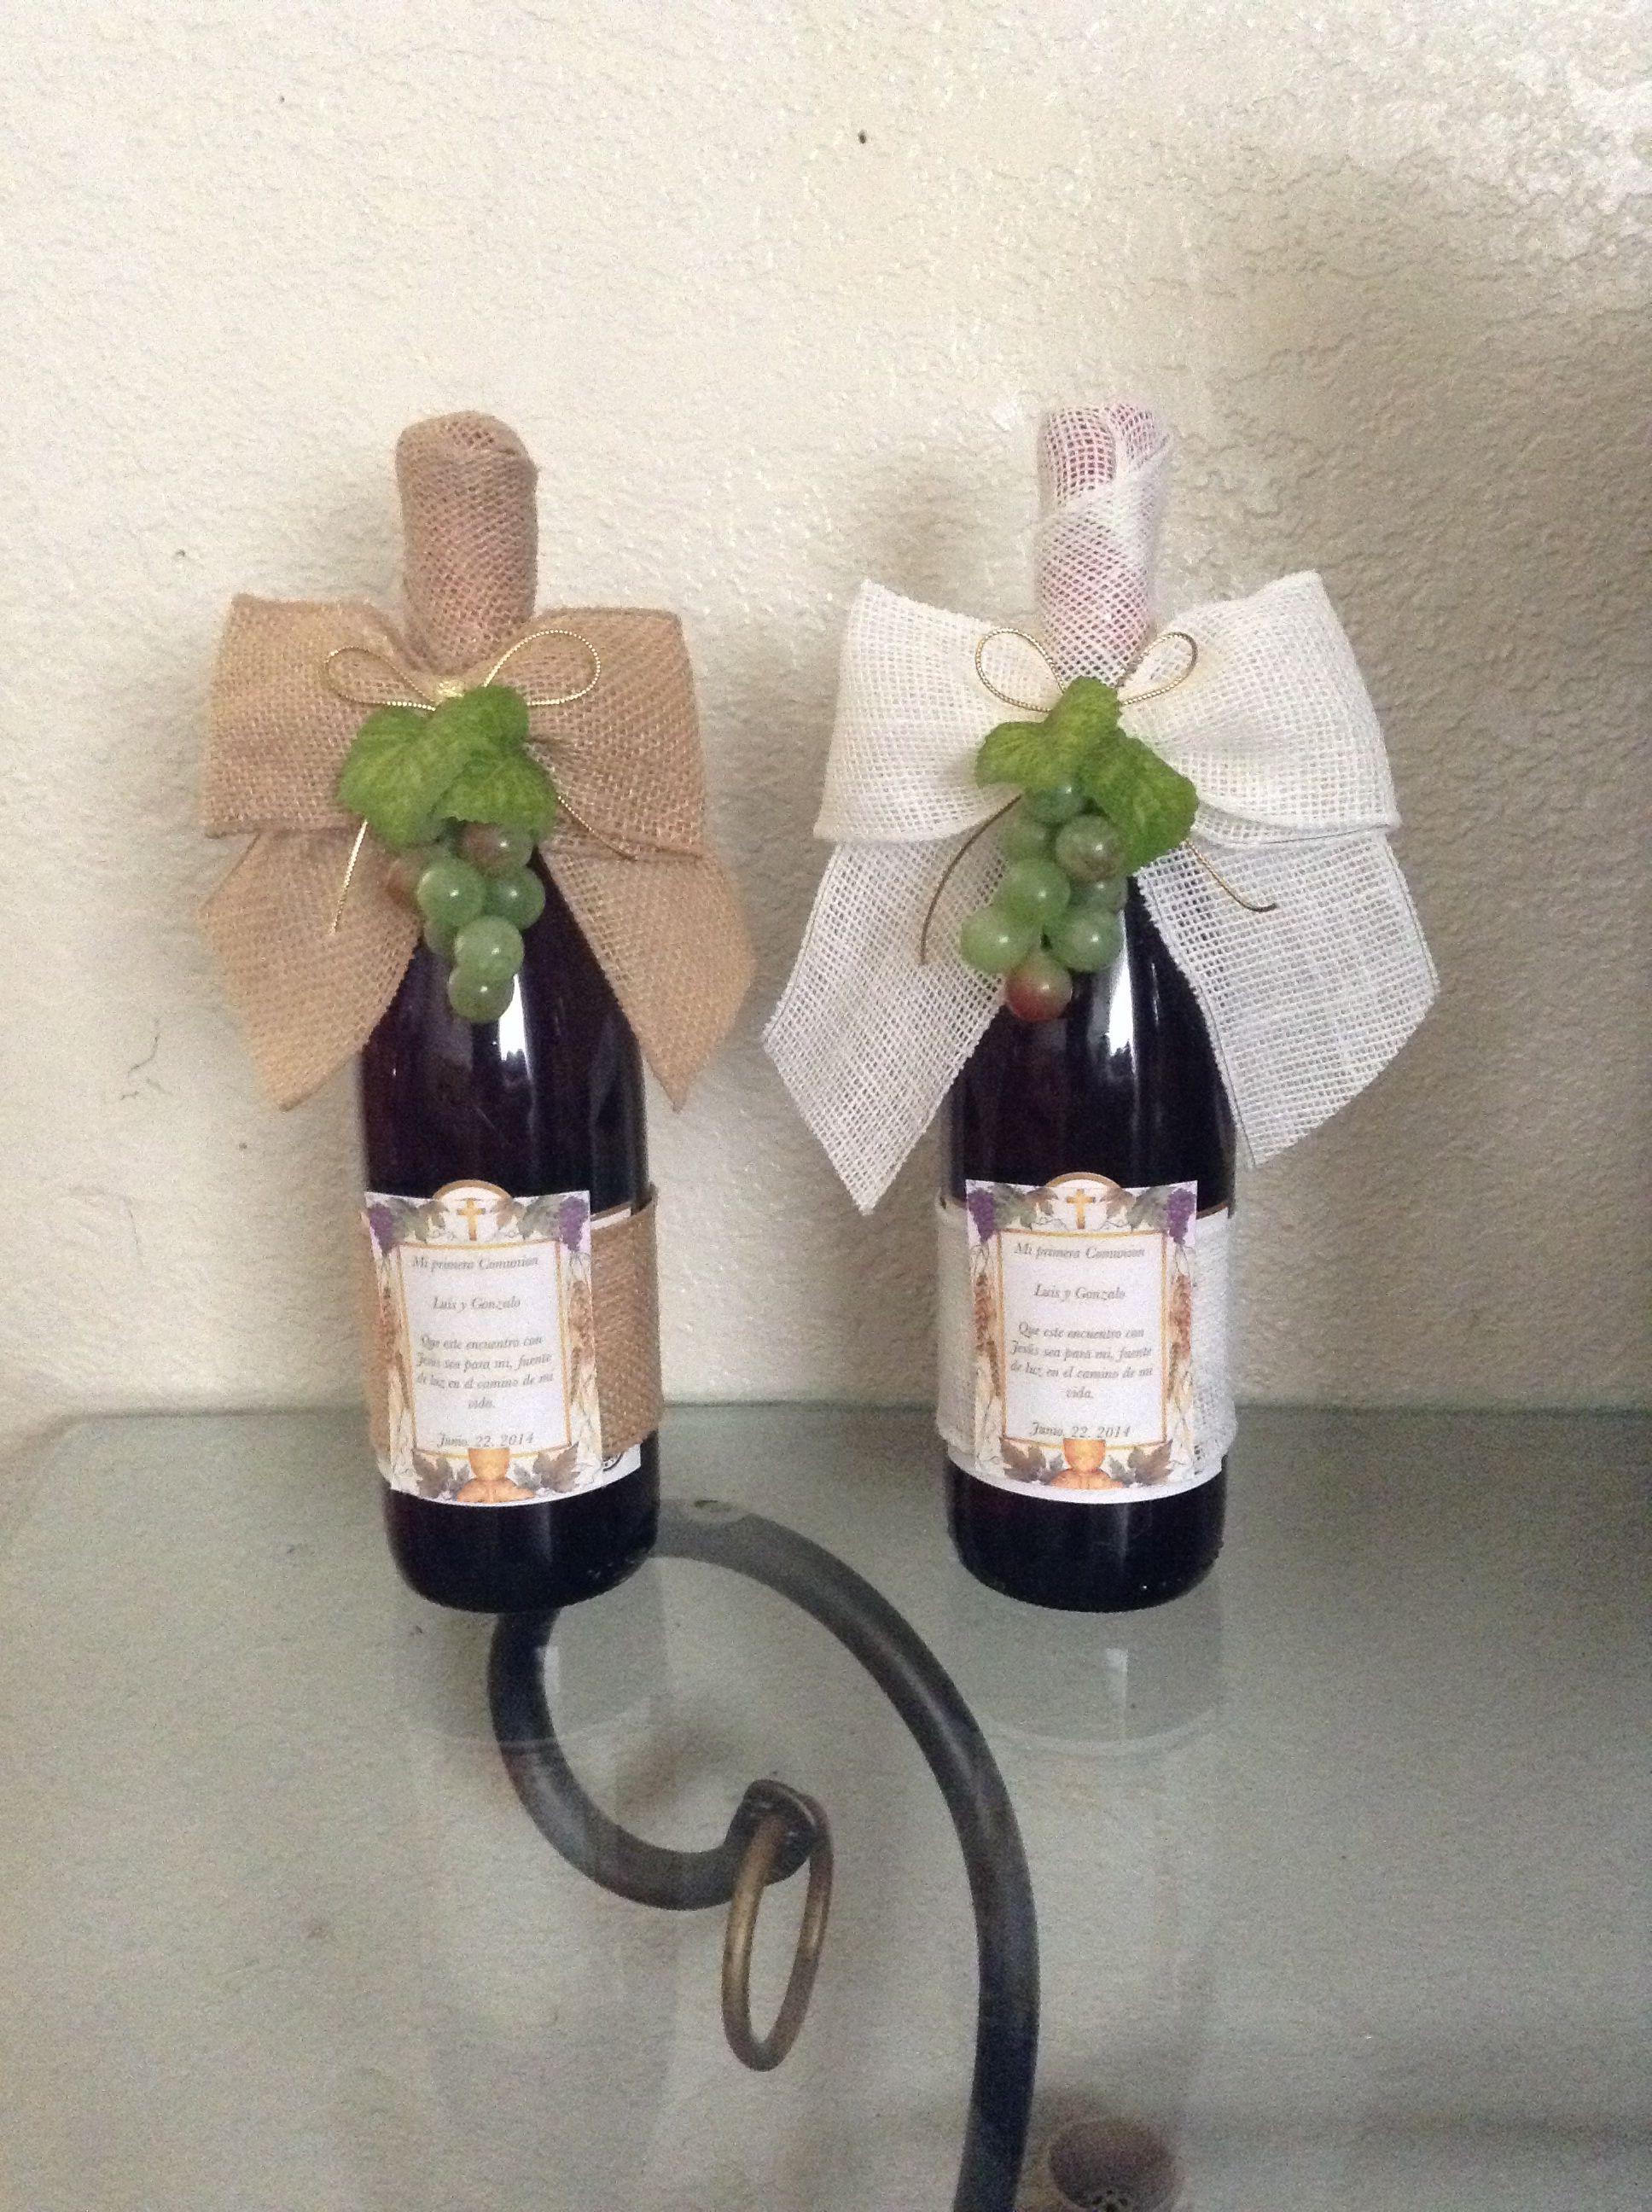 Botellas De Vino Para Regalar En Bautizos.Botellas De Vino Como Centro De Mesa Primera Comunion